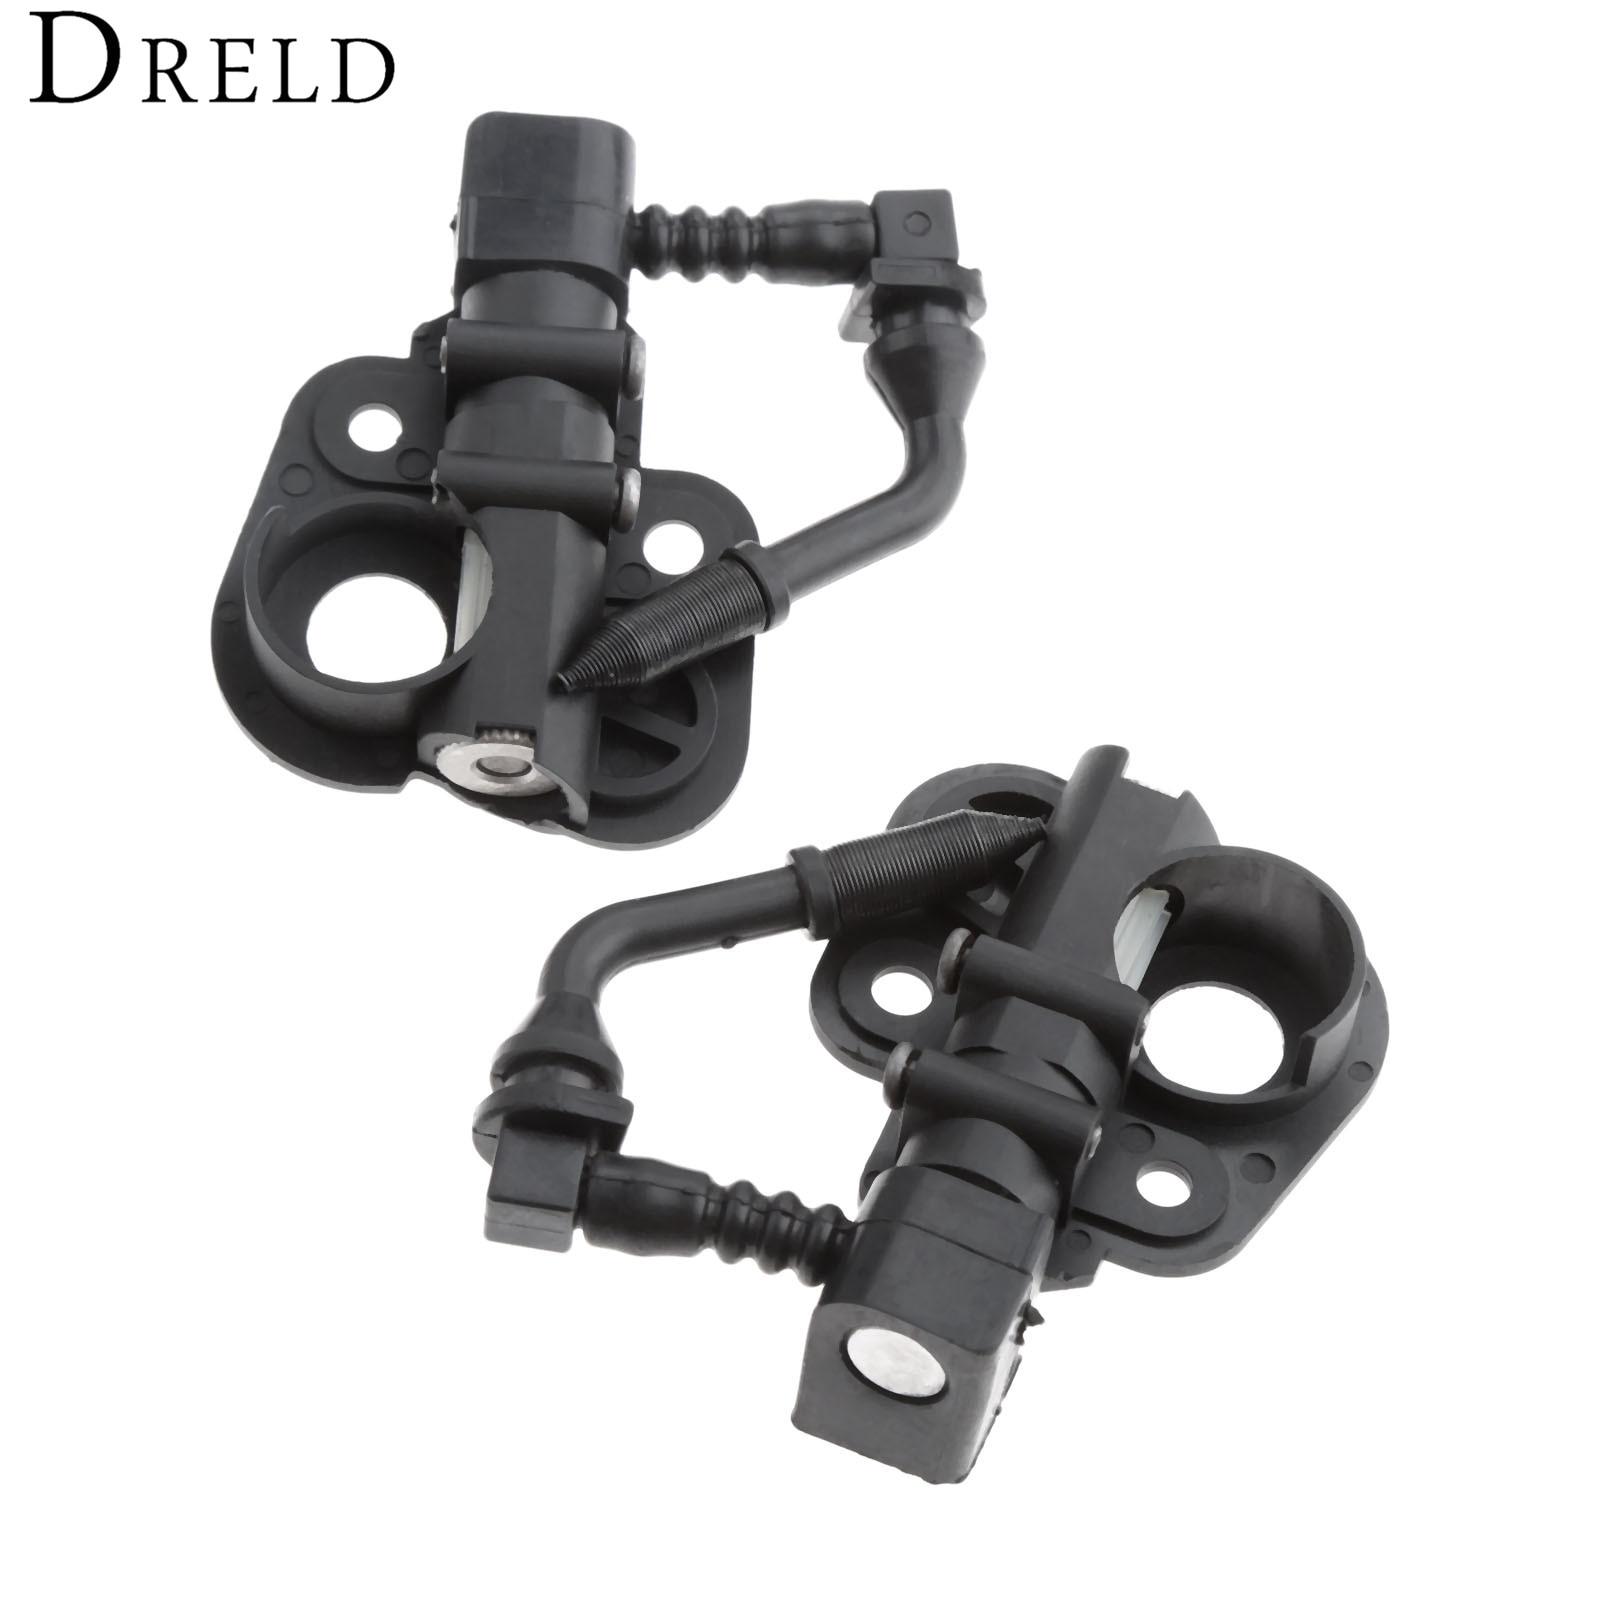 DRELD 2Pcs Oil Pump Garden Tool Parts For PARTNER 350 351 350 351 352 370 371 390 391 401 420 422 20X CHAINSAW ENGINE PARTS